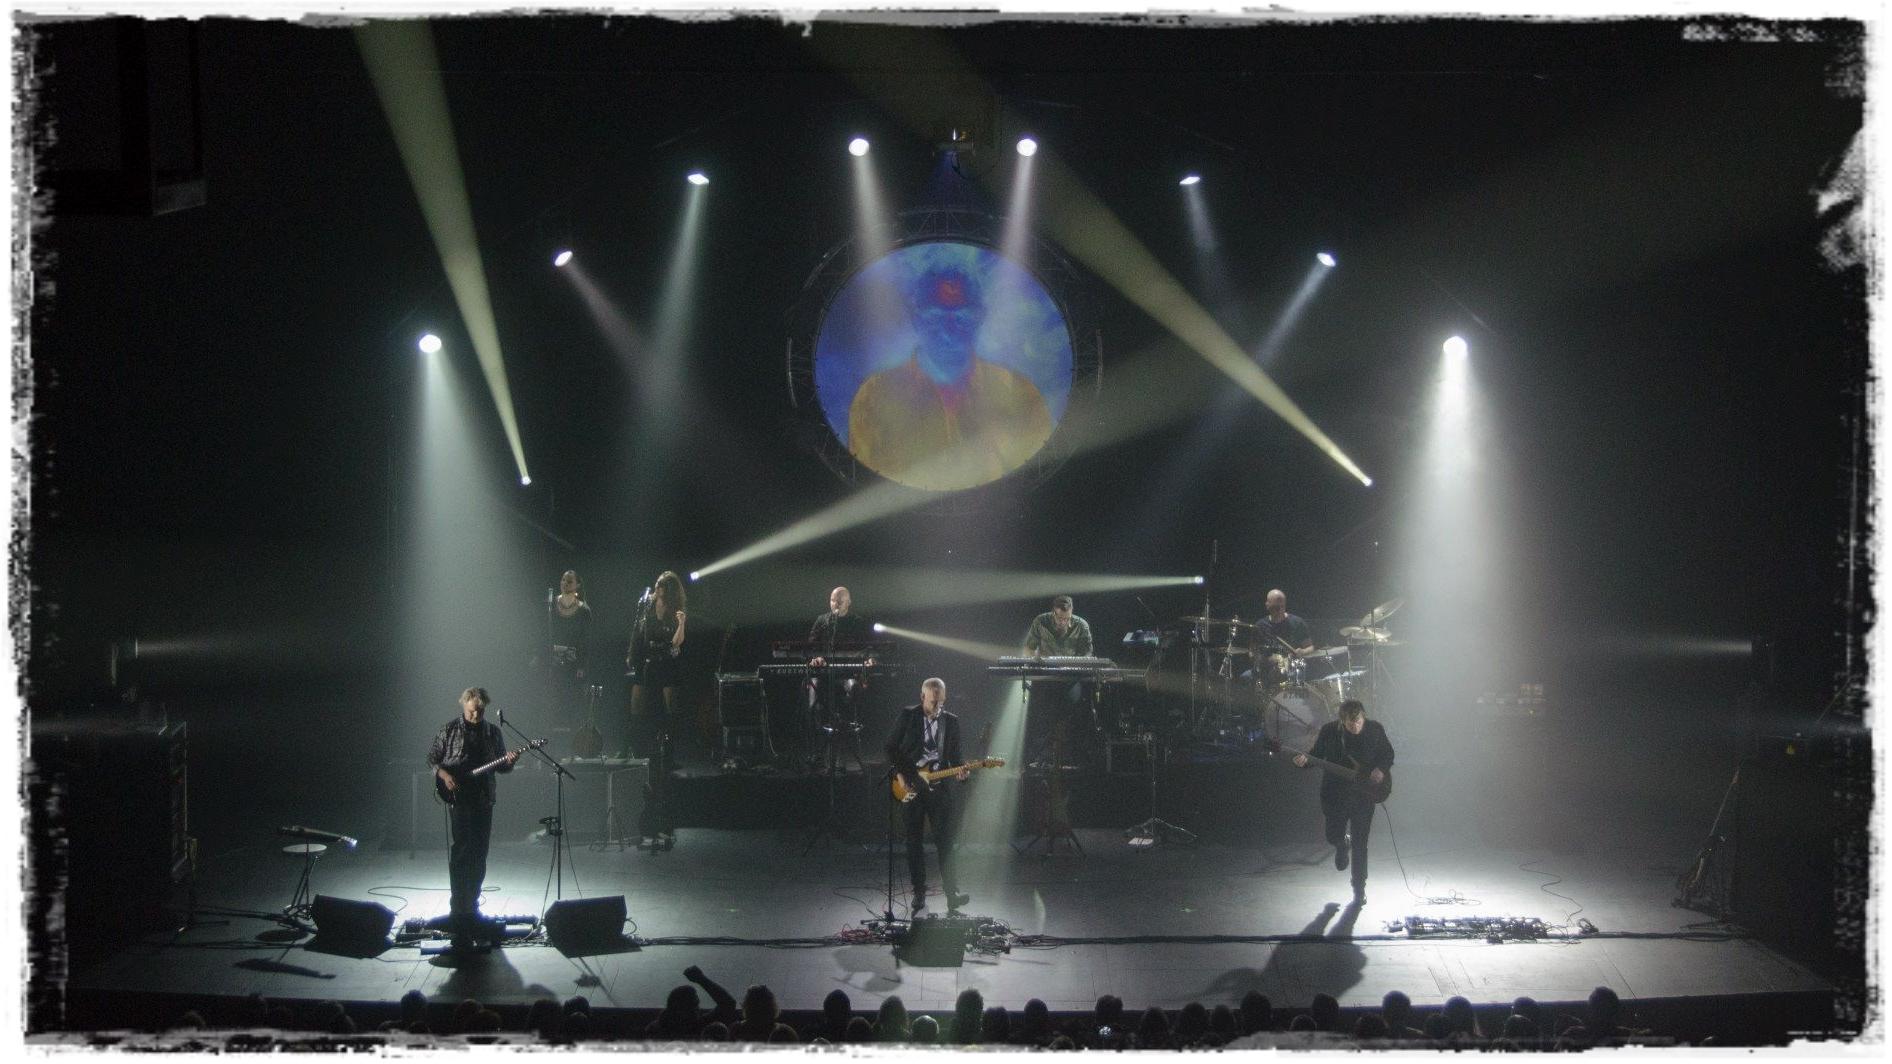 P-Floyd Tour 2014, Cirkus. Photo Mariah Sjöberg